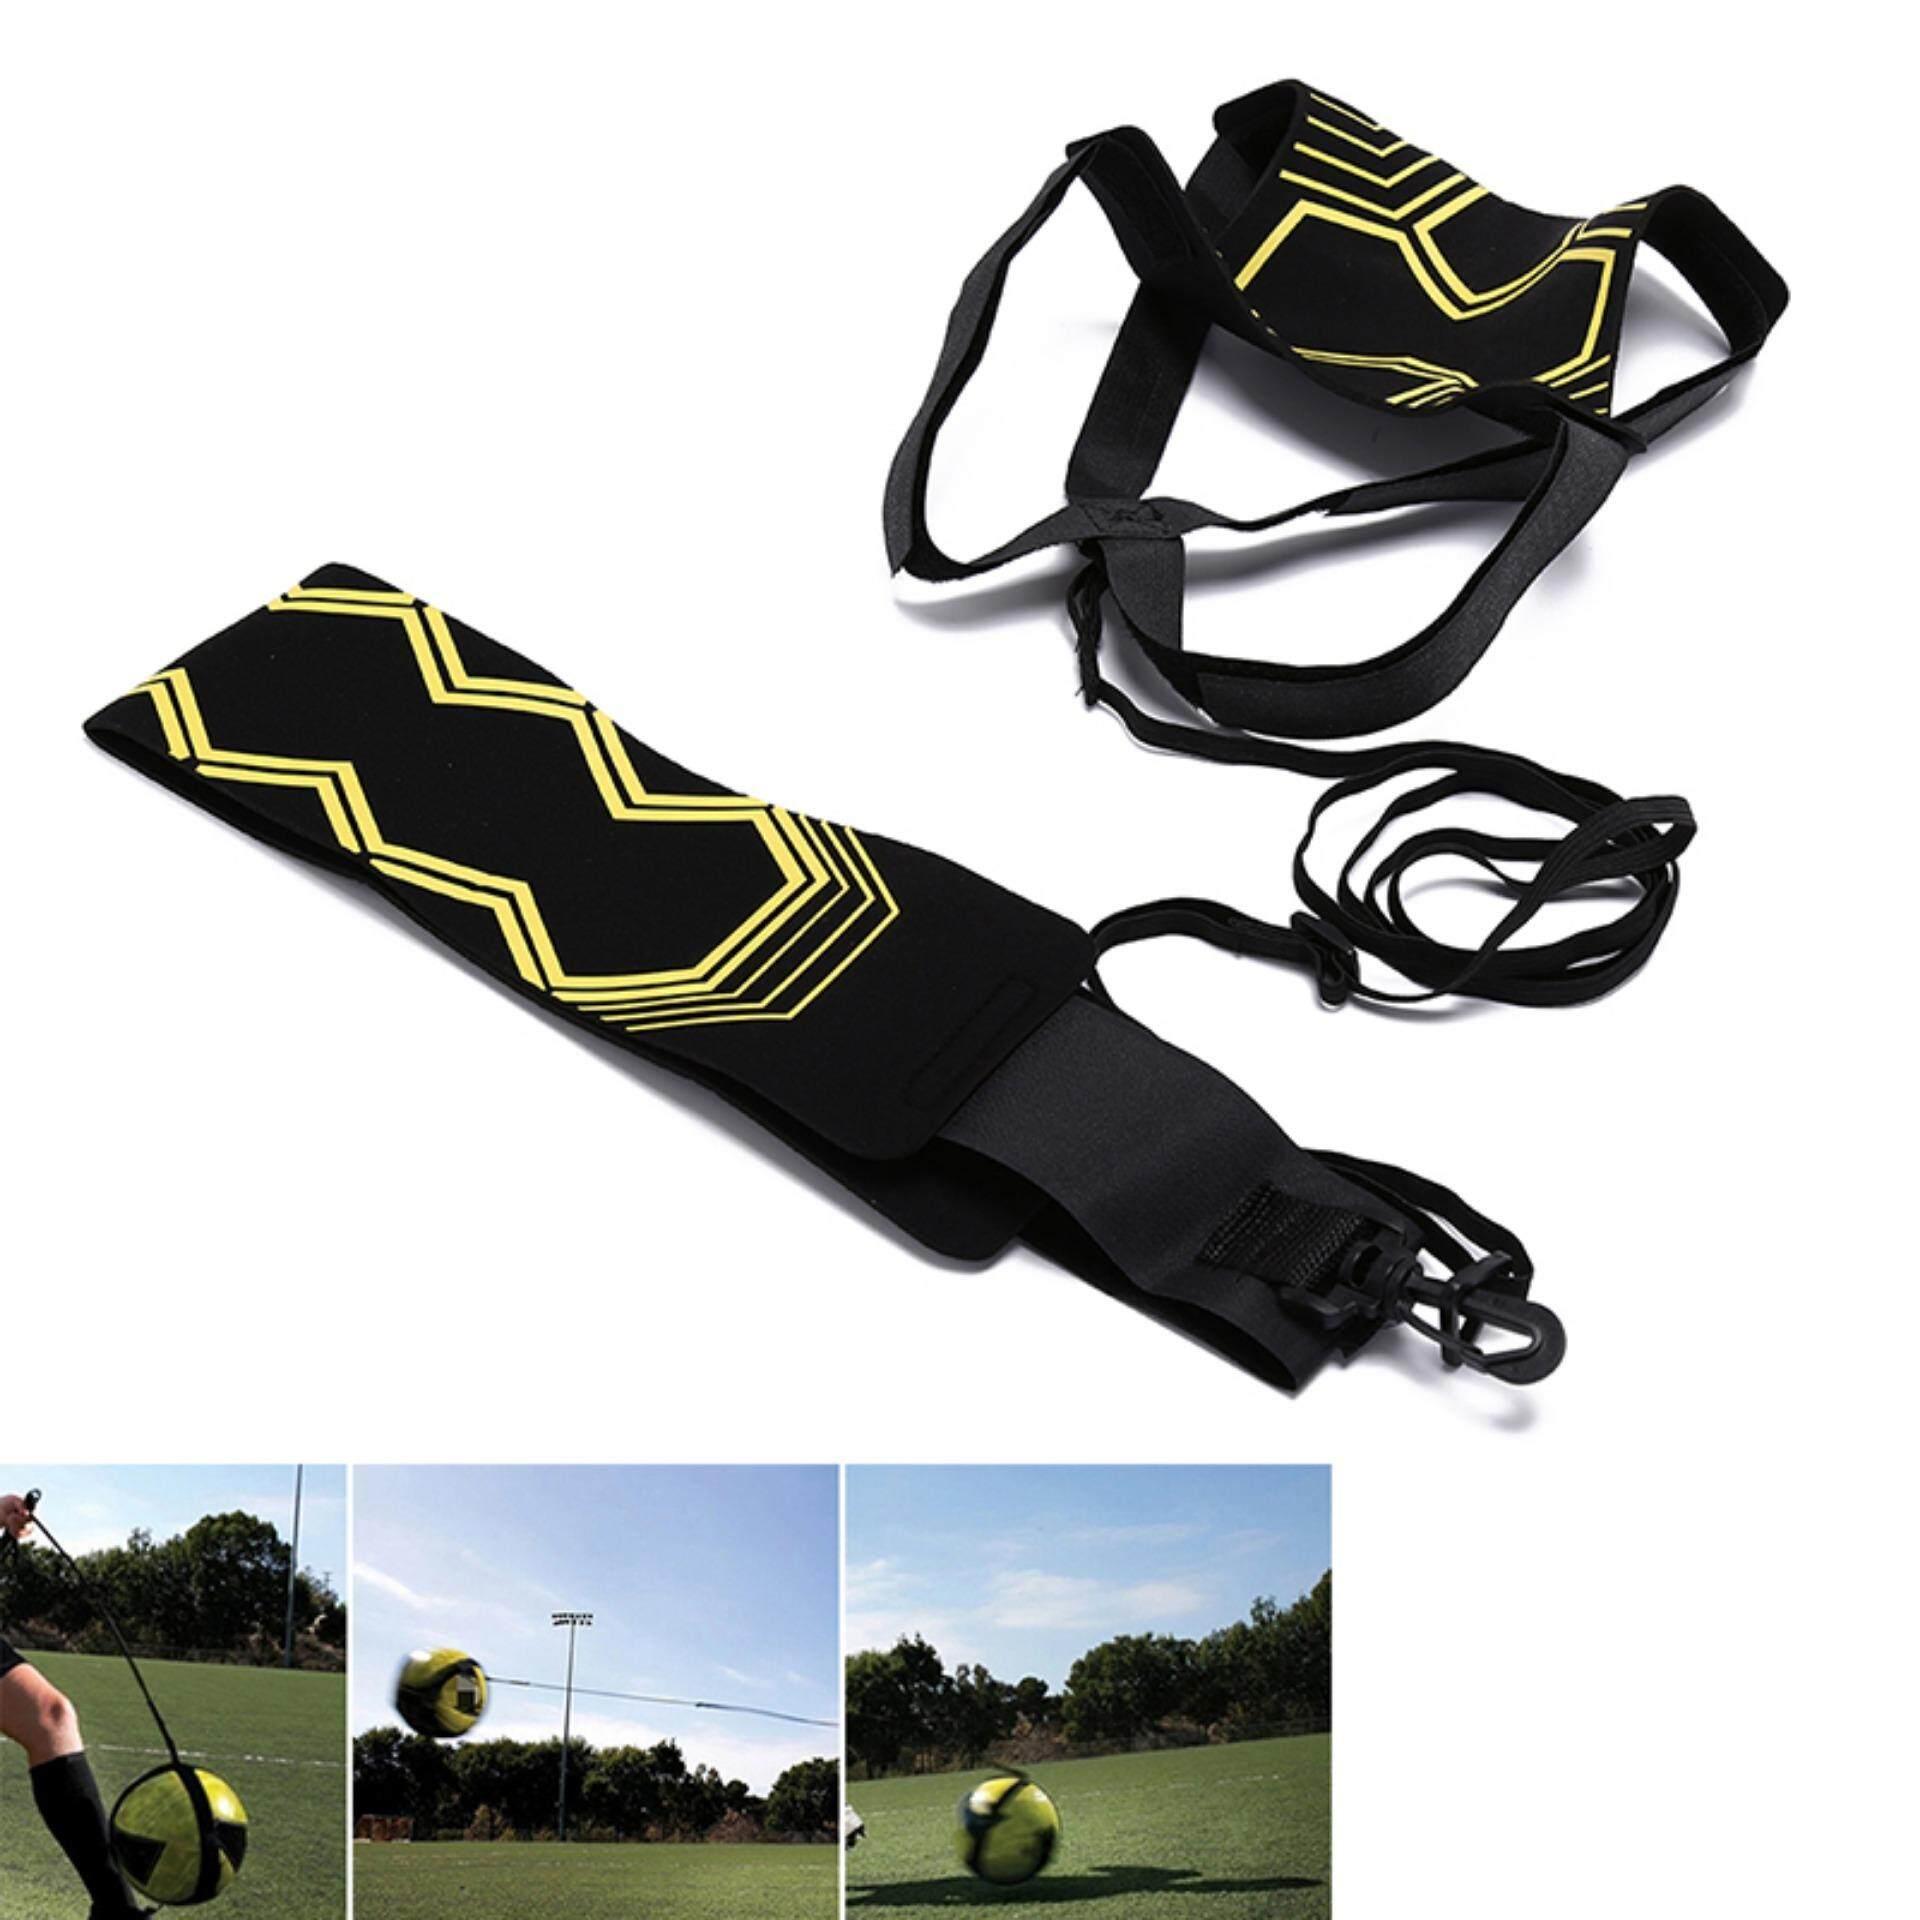 Hình ảnh Adjustable Soccer Trainer Belt Soccer Ball Training Equipment Kick Practice Yellow & Black 6m - intl